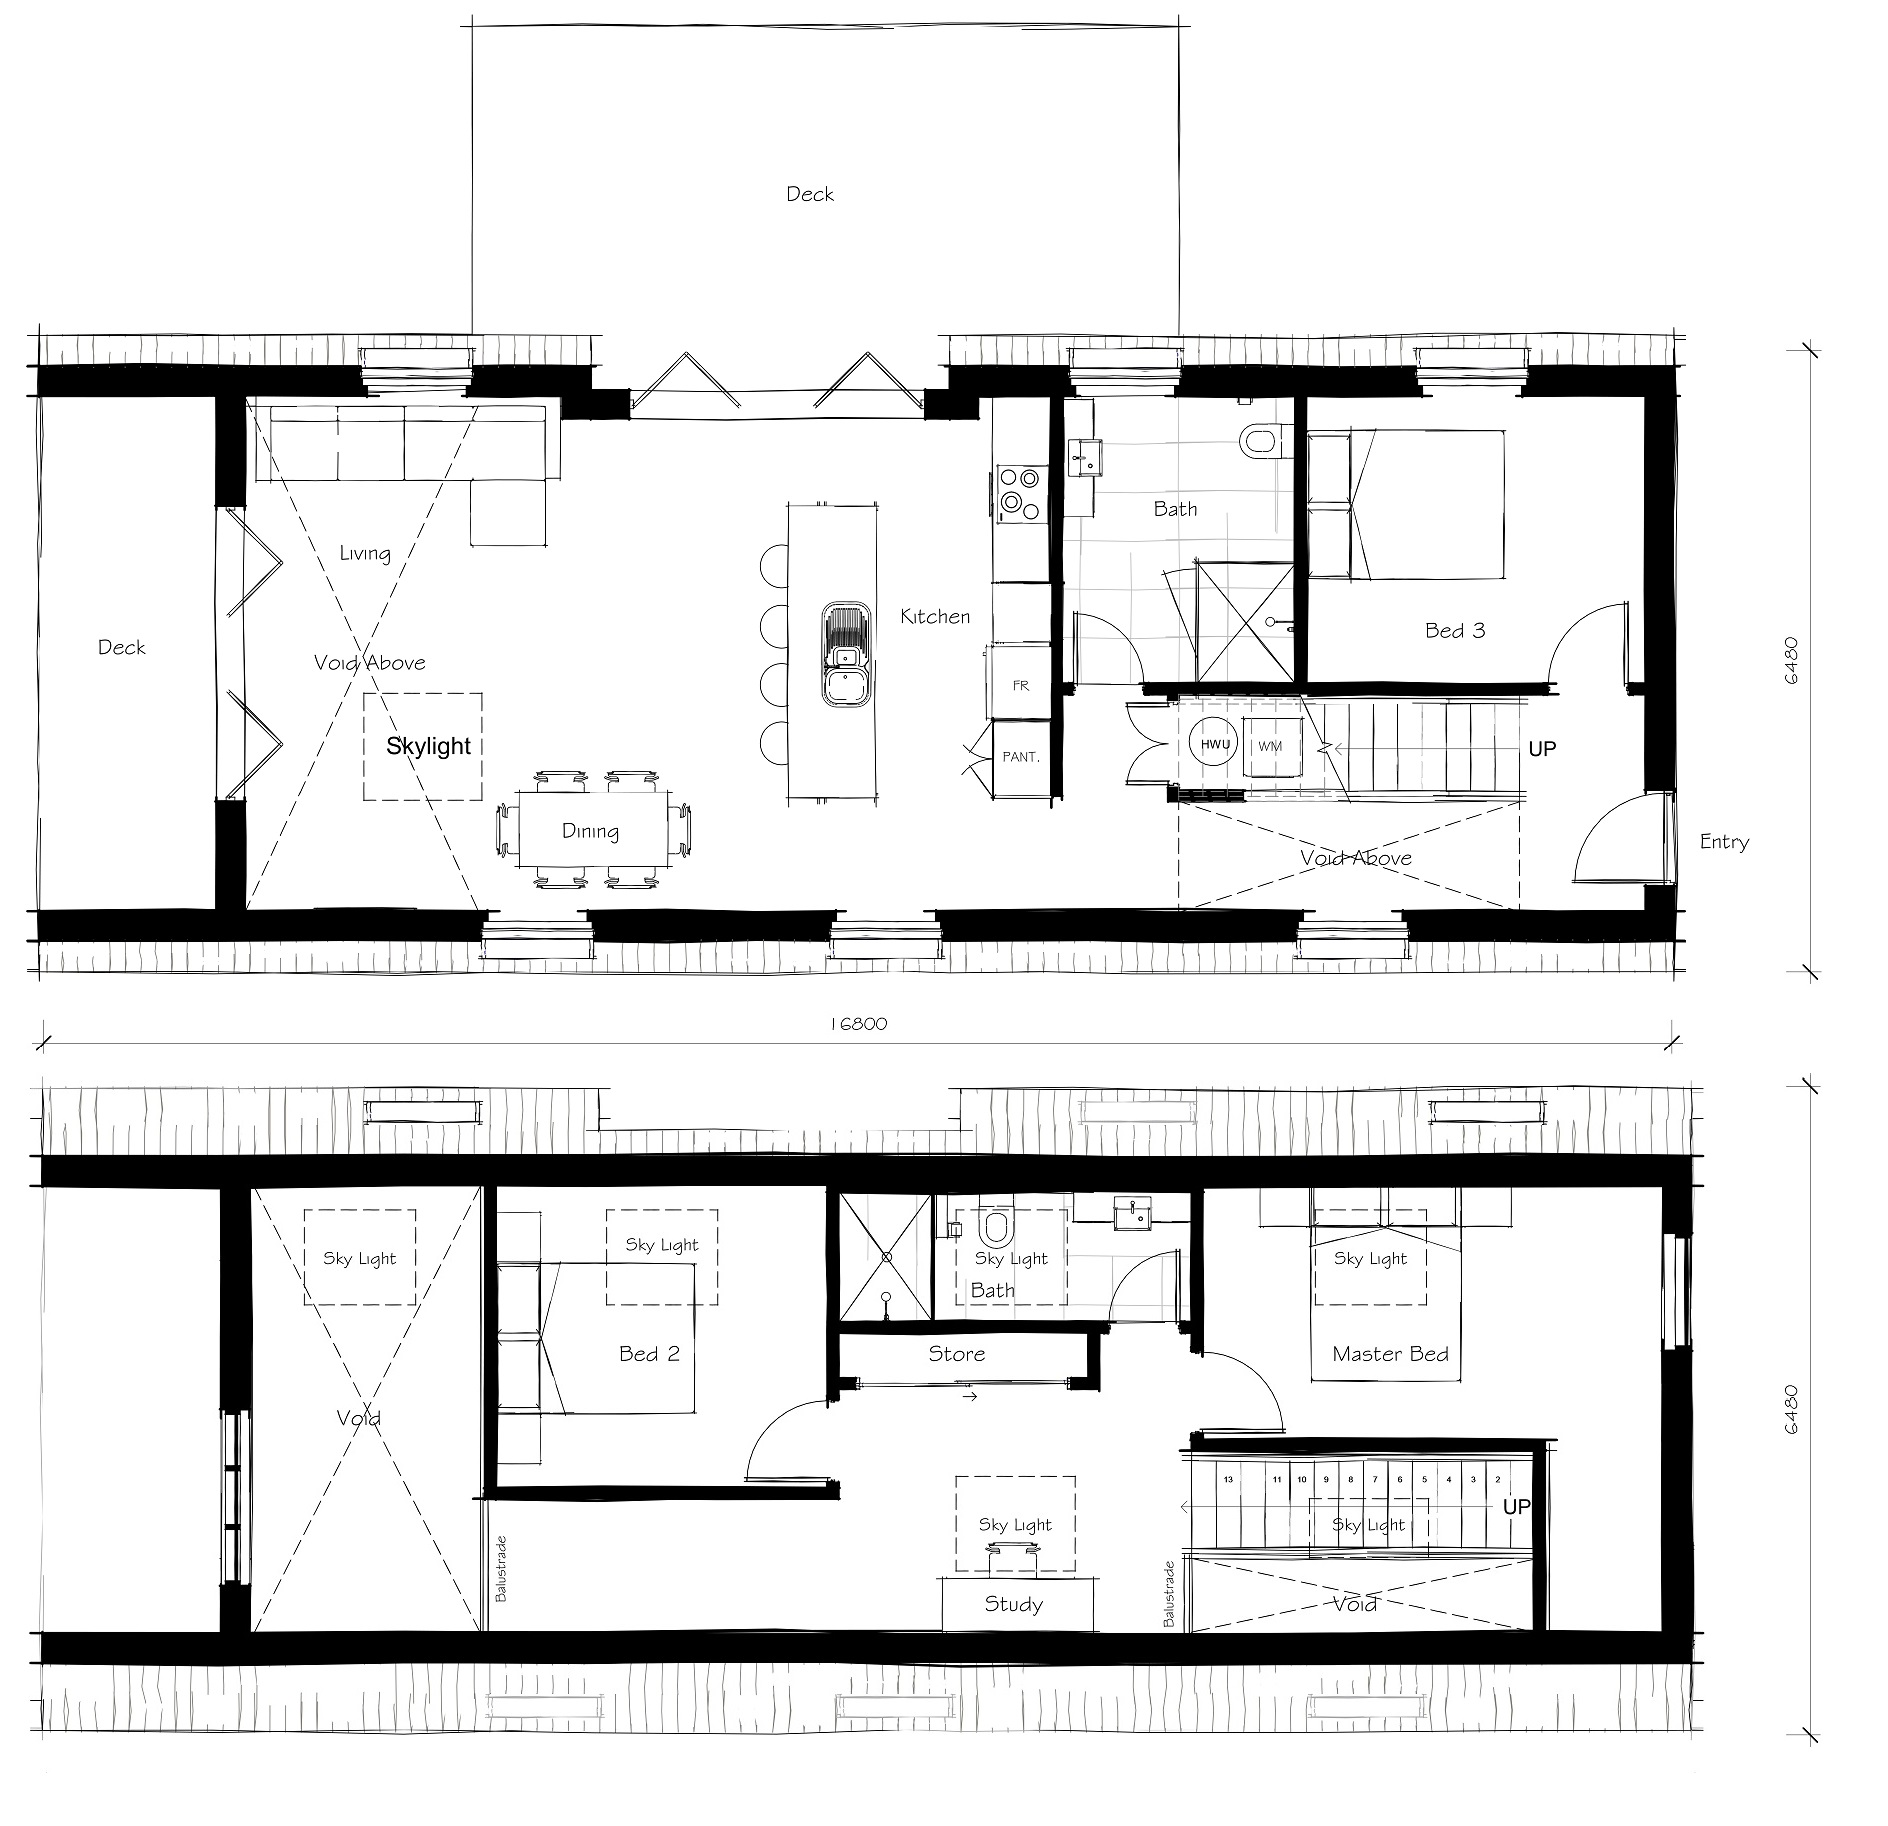 ambience floorplans and design